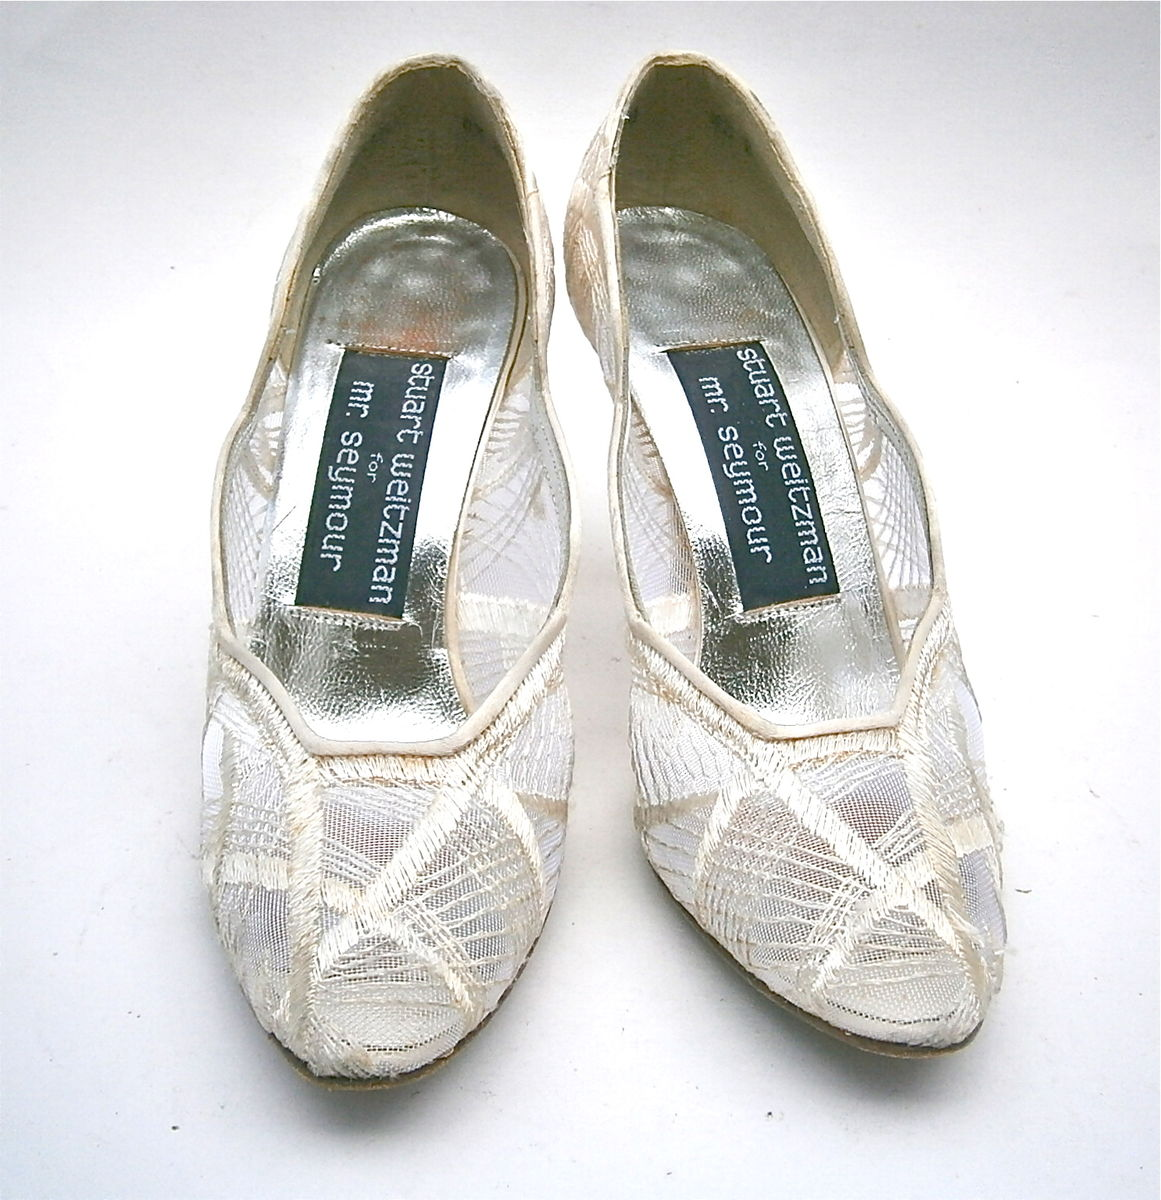 0ca58fe9195e ... Vintage Ivory Ladies Shoes Size 4.5B Satin White Pumps High Heels  Stuart Weitzman Embroidery Mesh ...